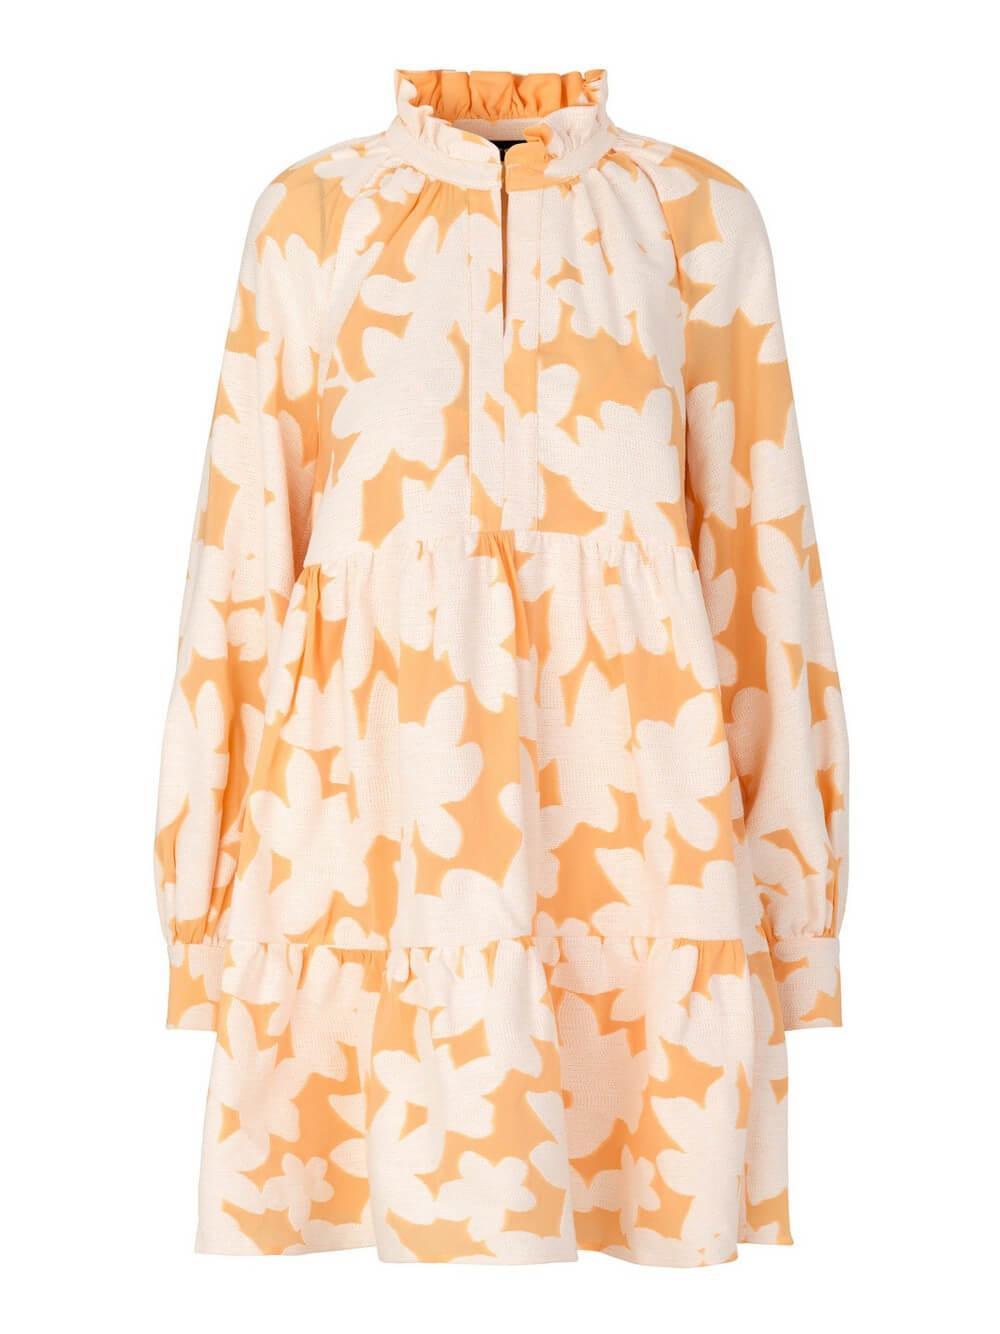 Jasmine Cotton Jacquard Dress Item # SG3114